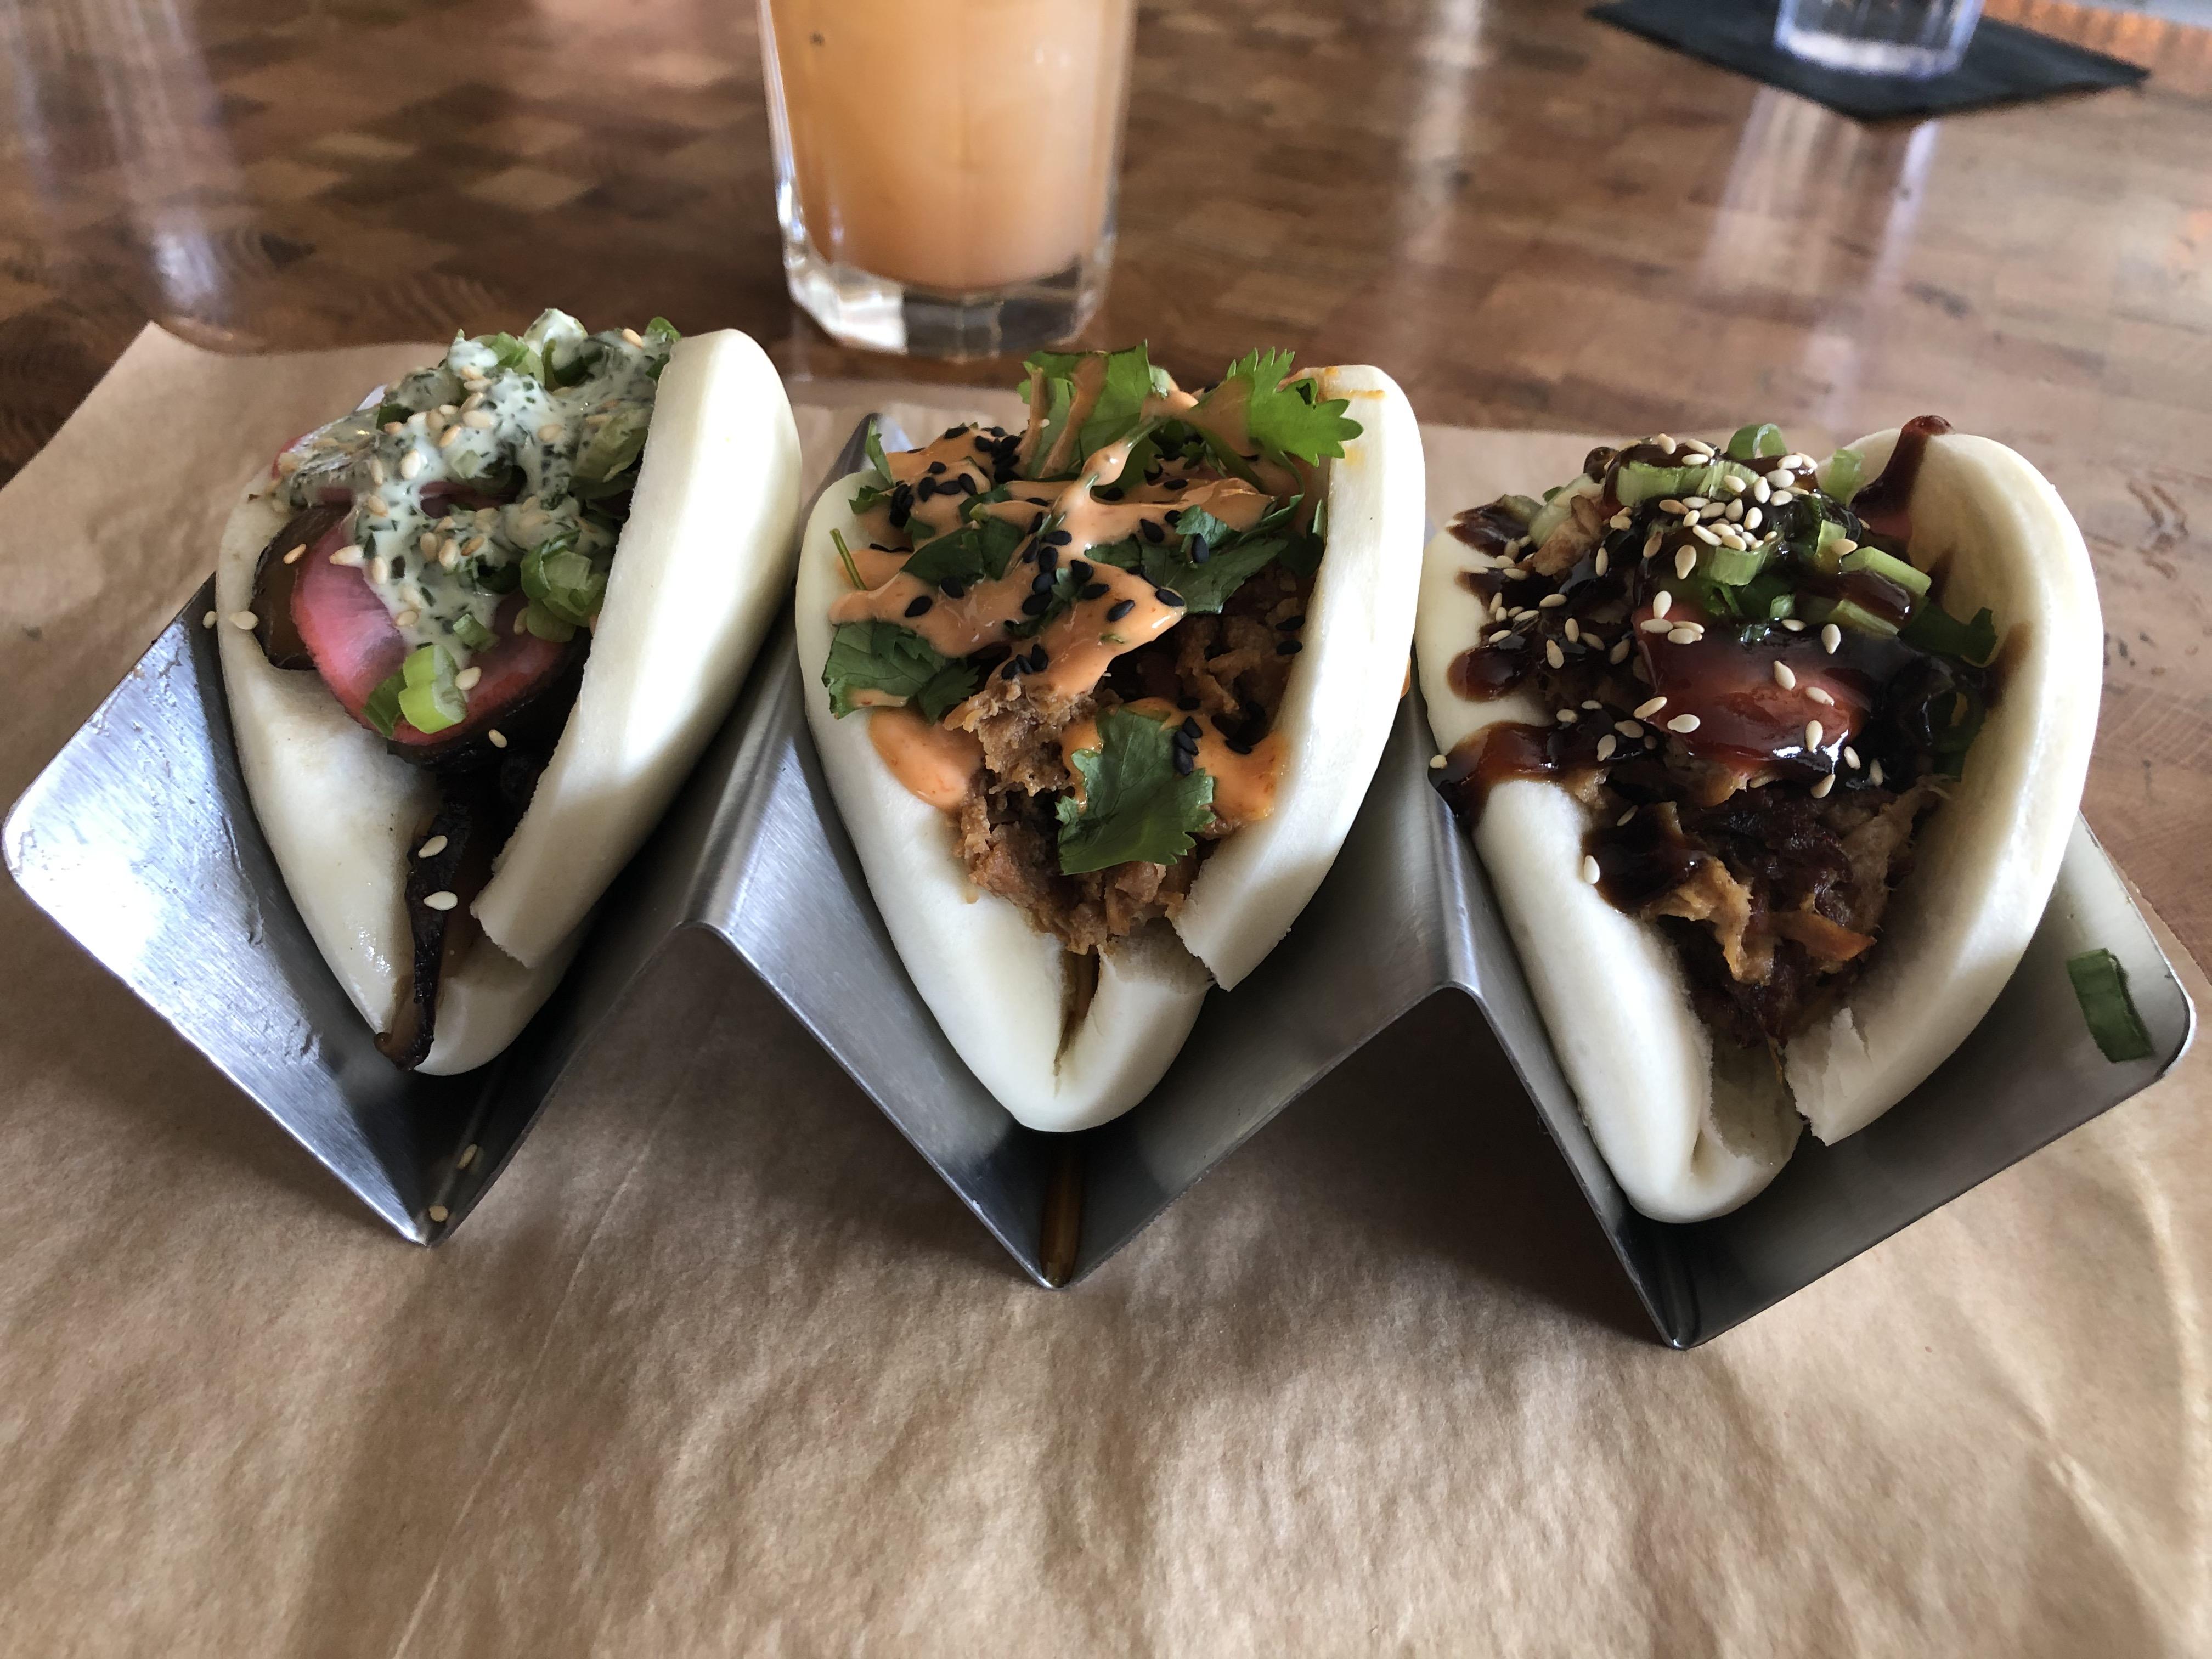 A photo of a trey containing Meta Asian Kitchen's shiitake mushroom (left), pork (center) and chicken bao buns